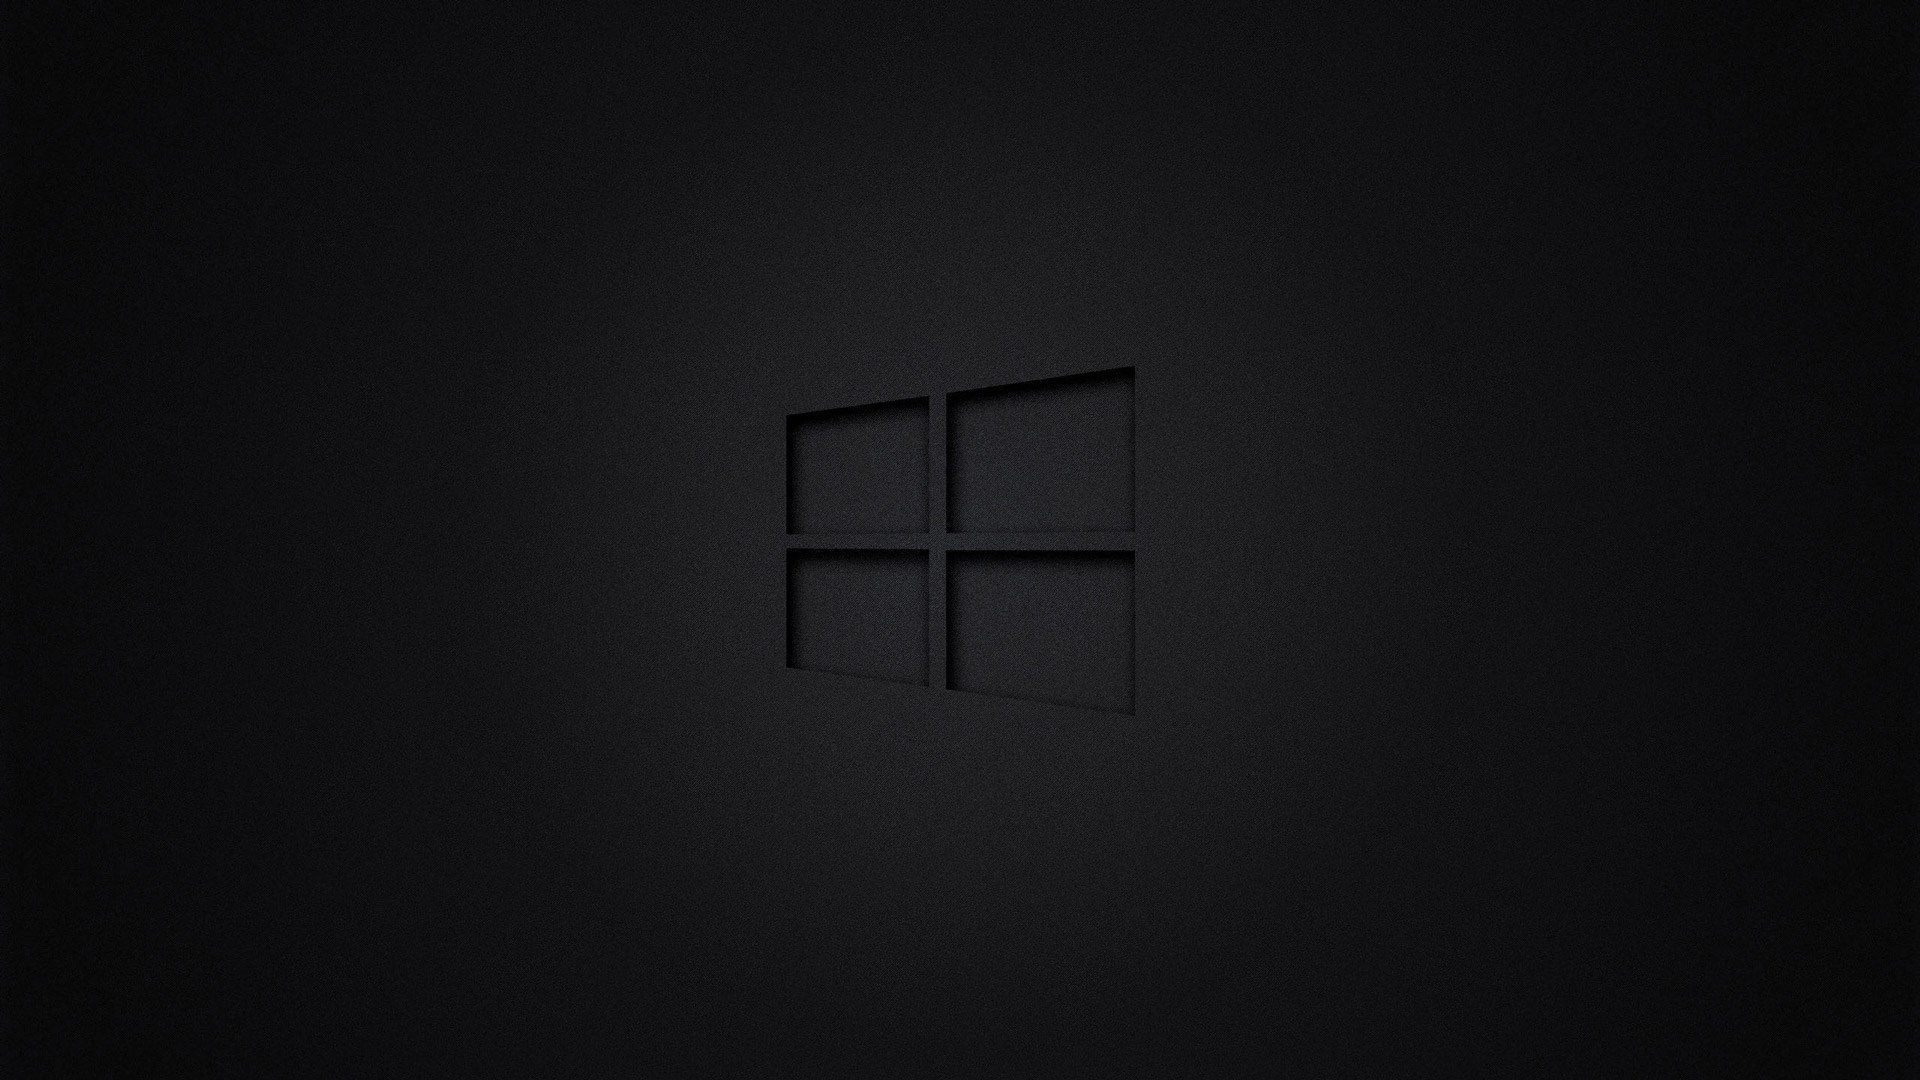 1920x1080 windows 10 high res wallpaper 검은 배경화면, 검은 배경, 배경화면